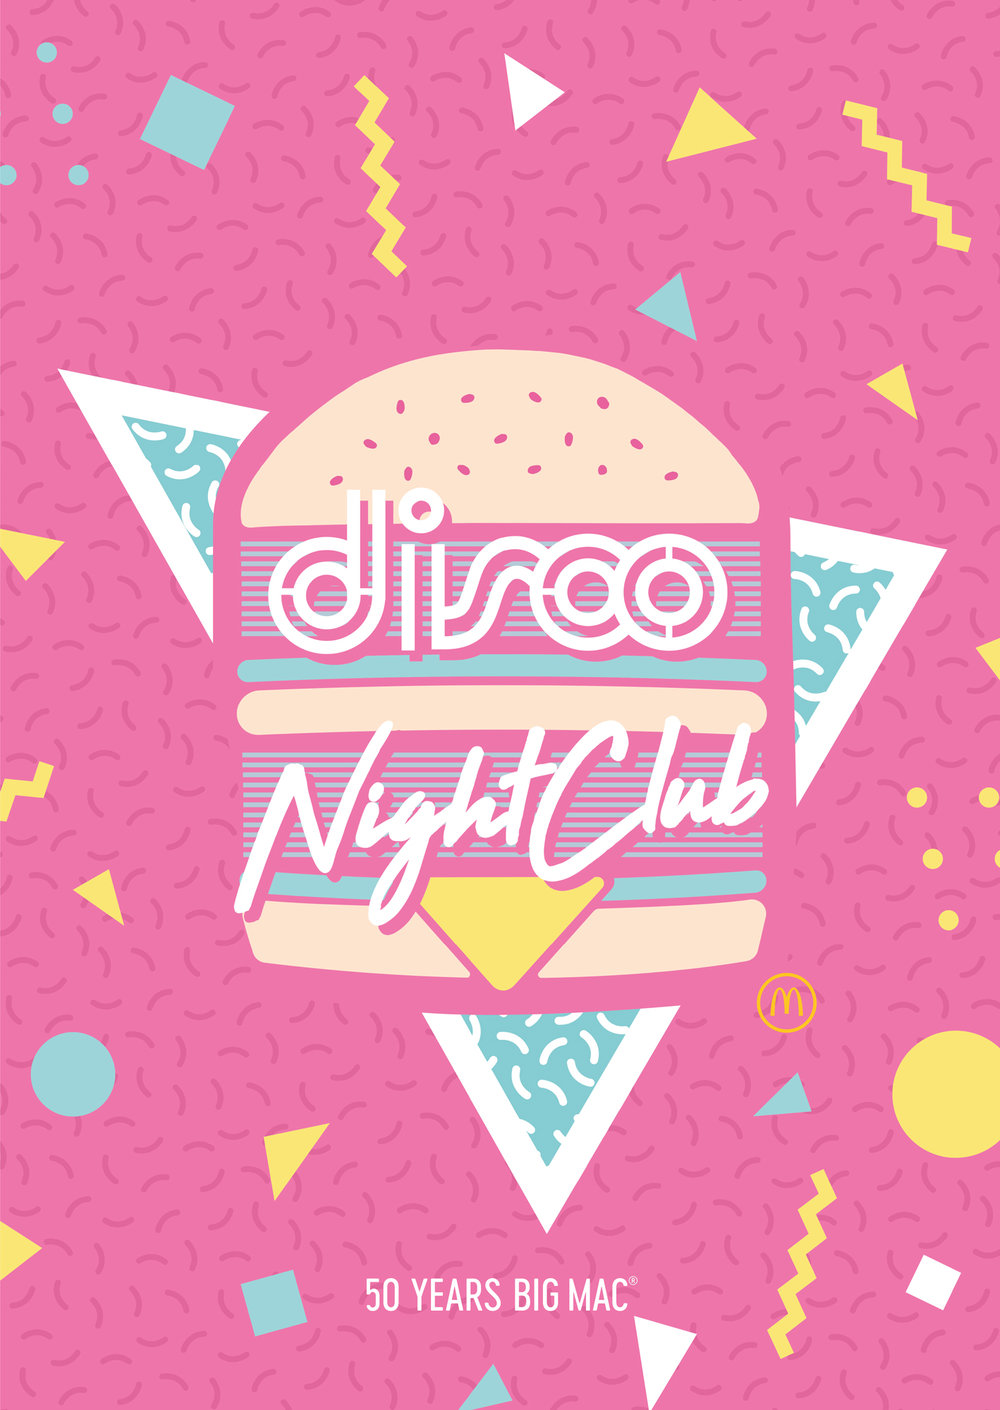 9_Disco_Club.jpg